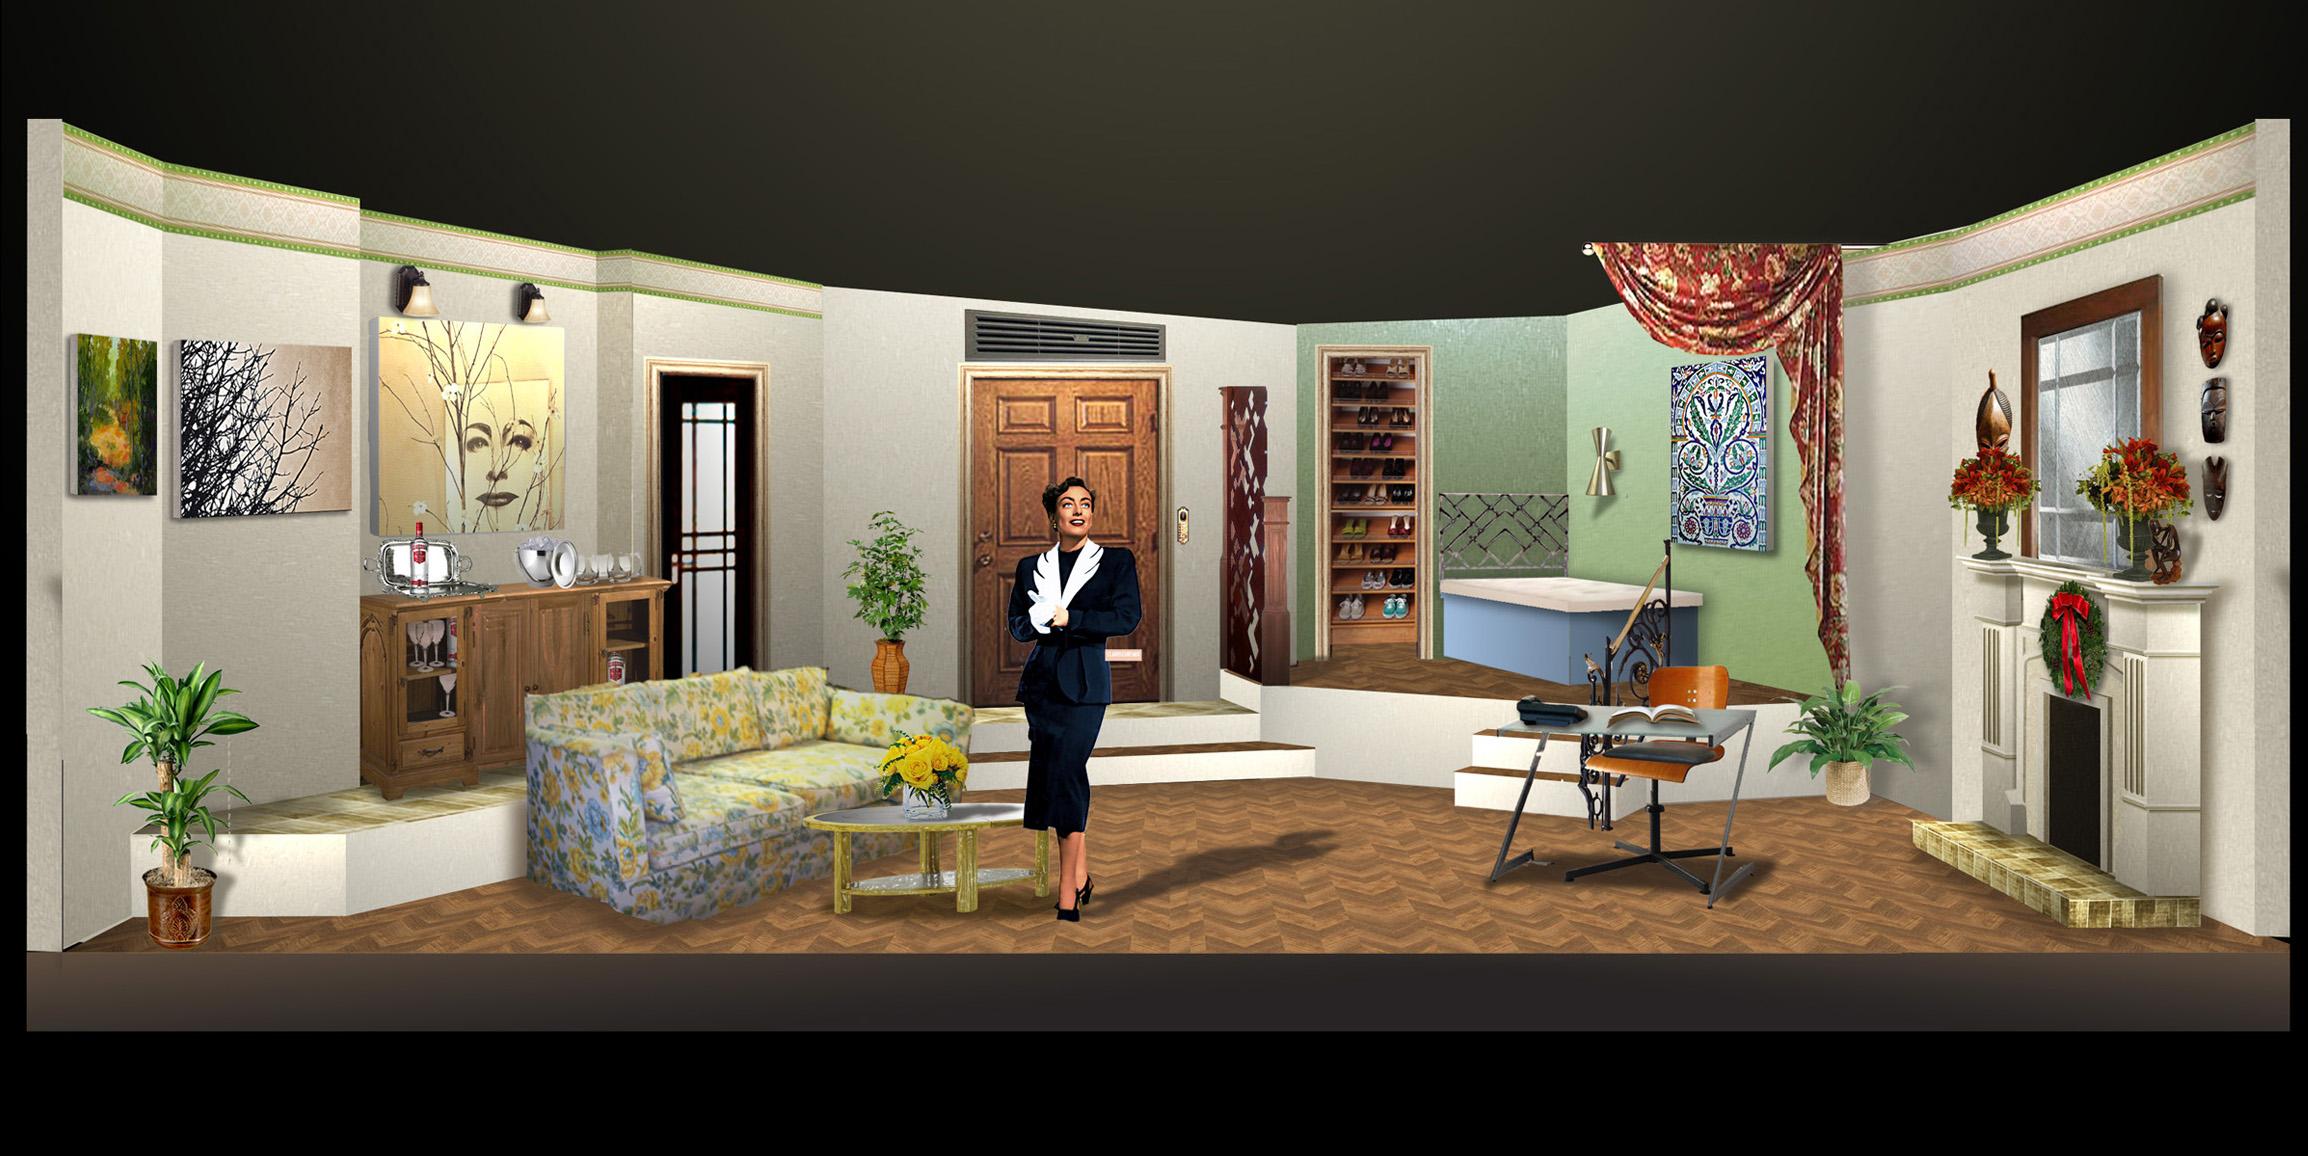 Fullsize Of Joan Crawford House